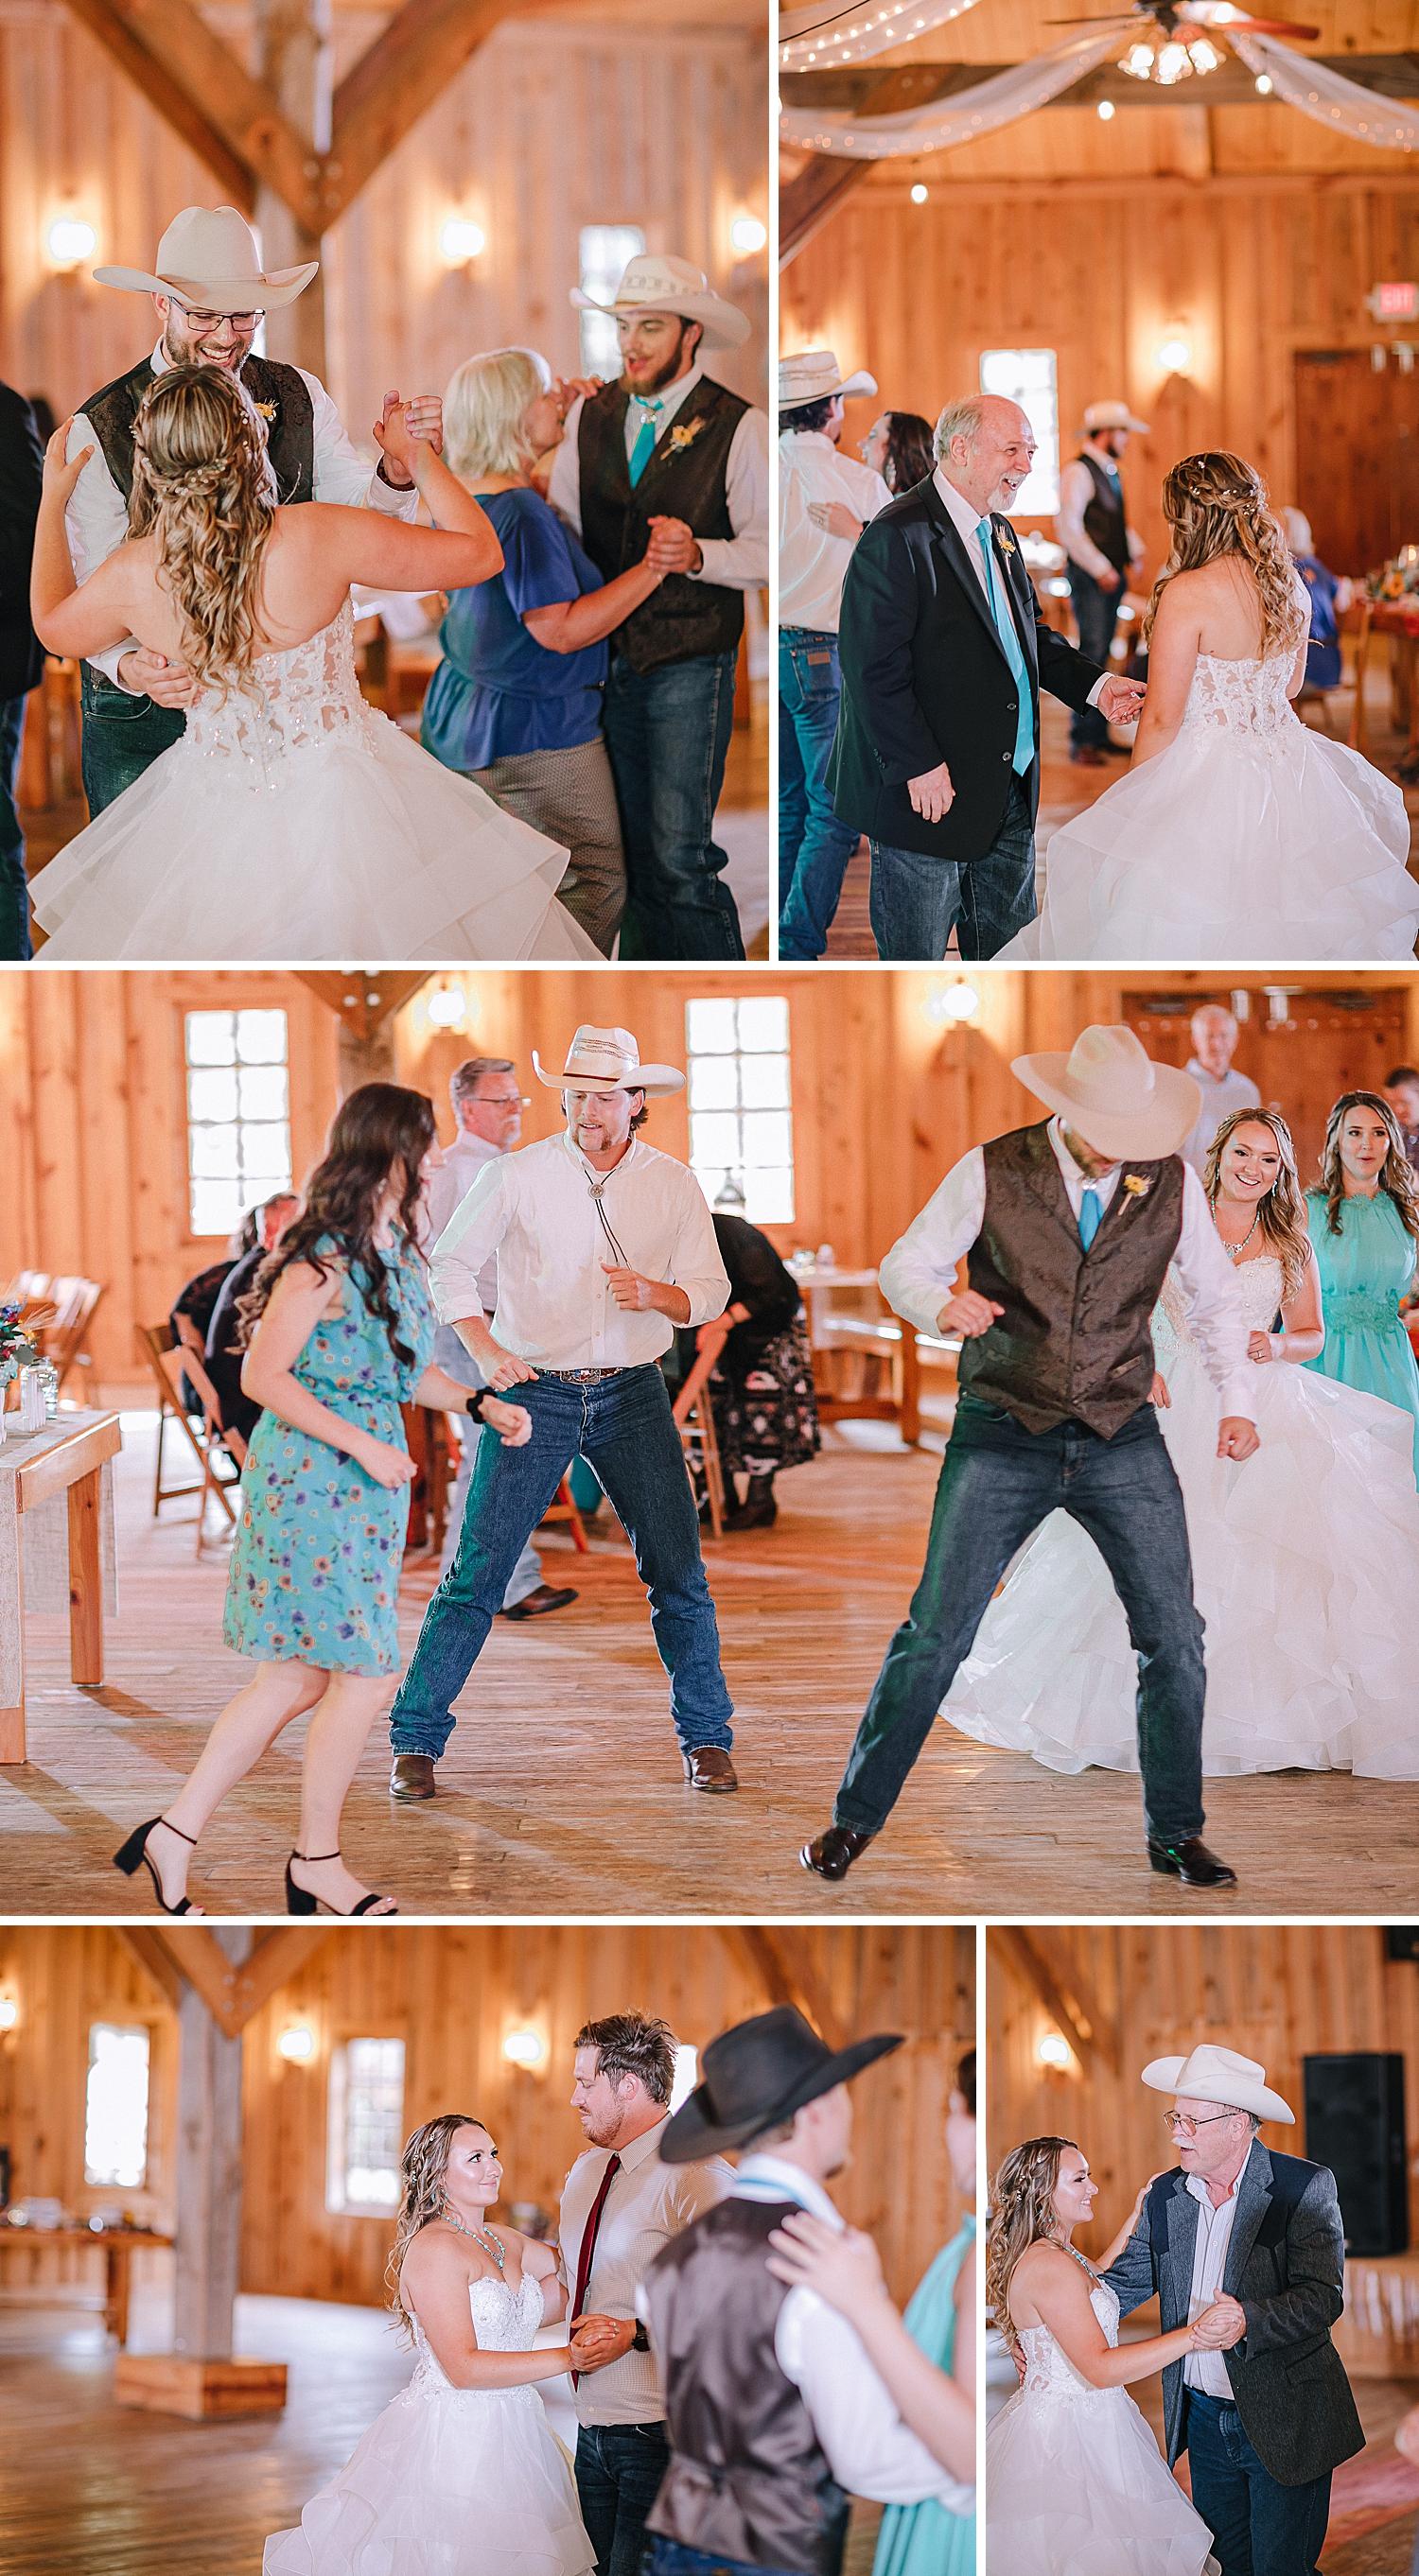 Carly-Barton-Photography-Old-Town-Texas-Rustic-Wedding-Photos-Sunflowers-Boots-Kyle-Texas_0101.jpg